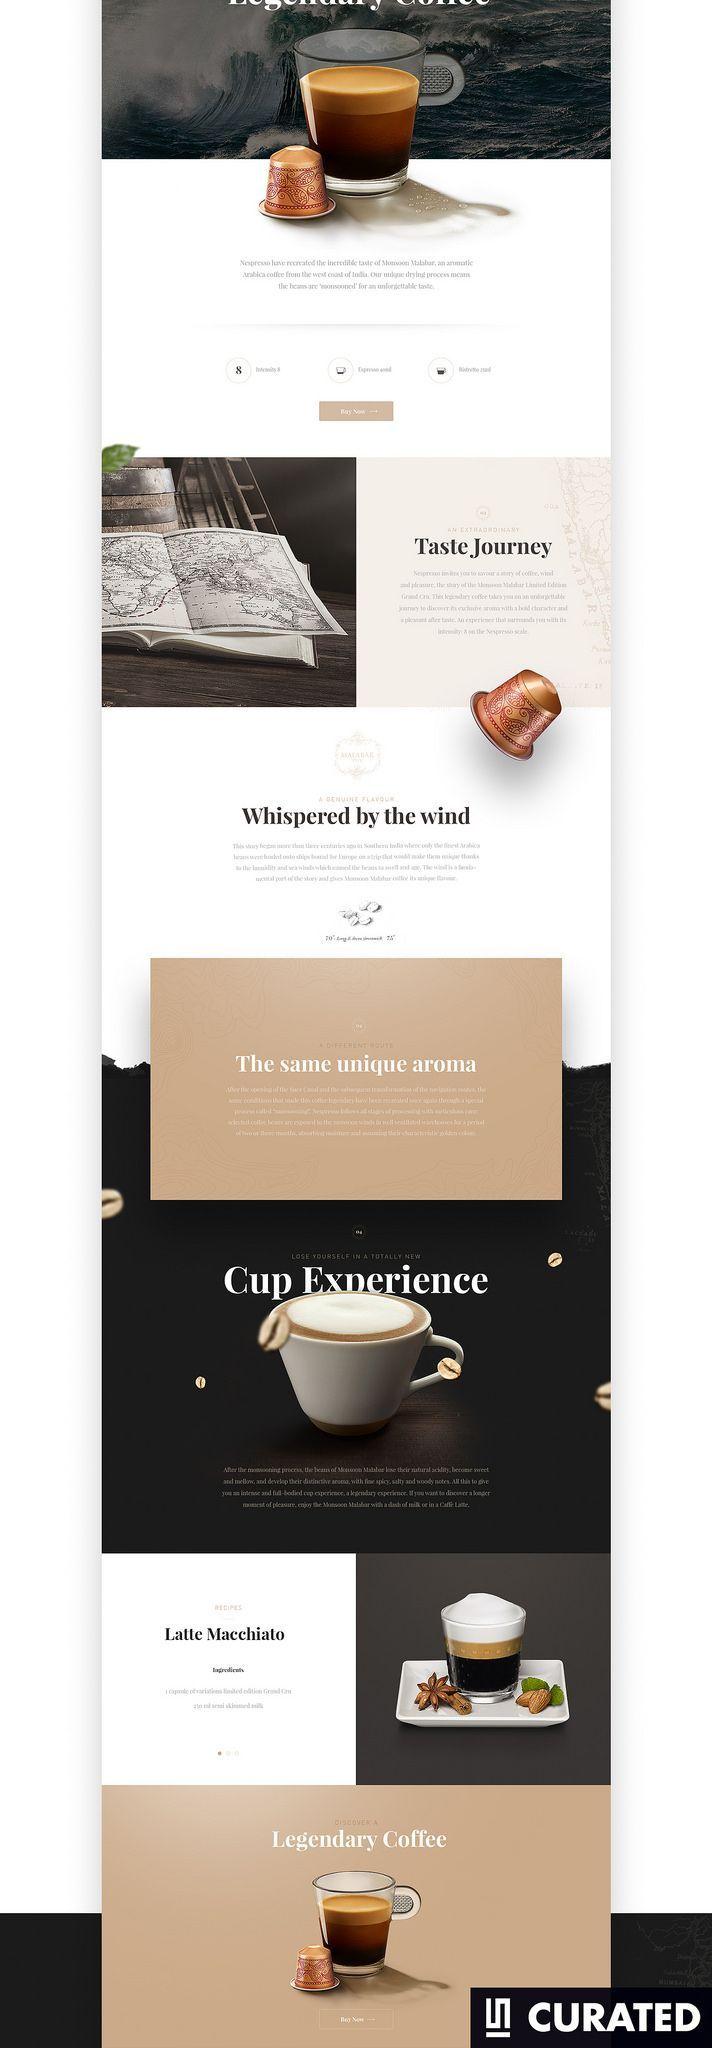 https://flic.kr/p/NAQ1qN?utm_content=buffere946b&utm_medium=social&utm_source=pinterest.com&utm_campaign=buffer | Web-Design-Inspiration-0376